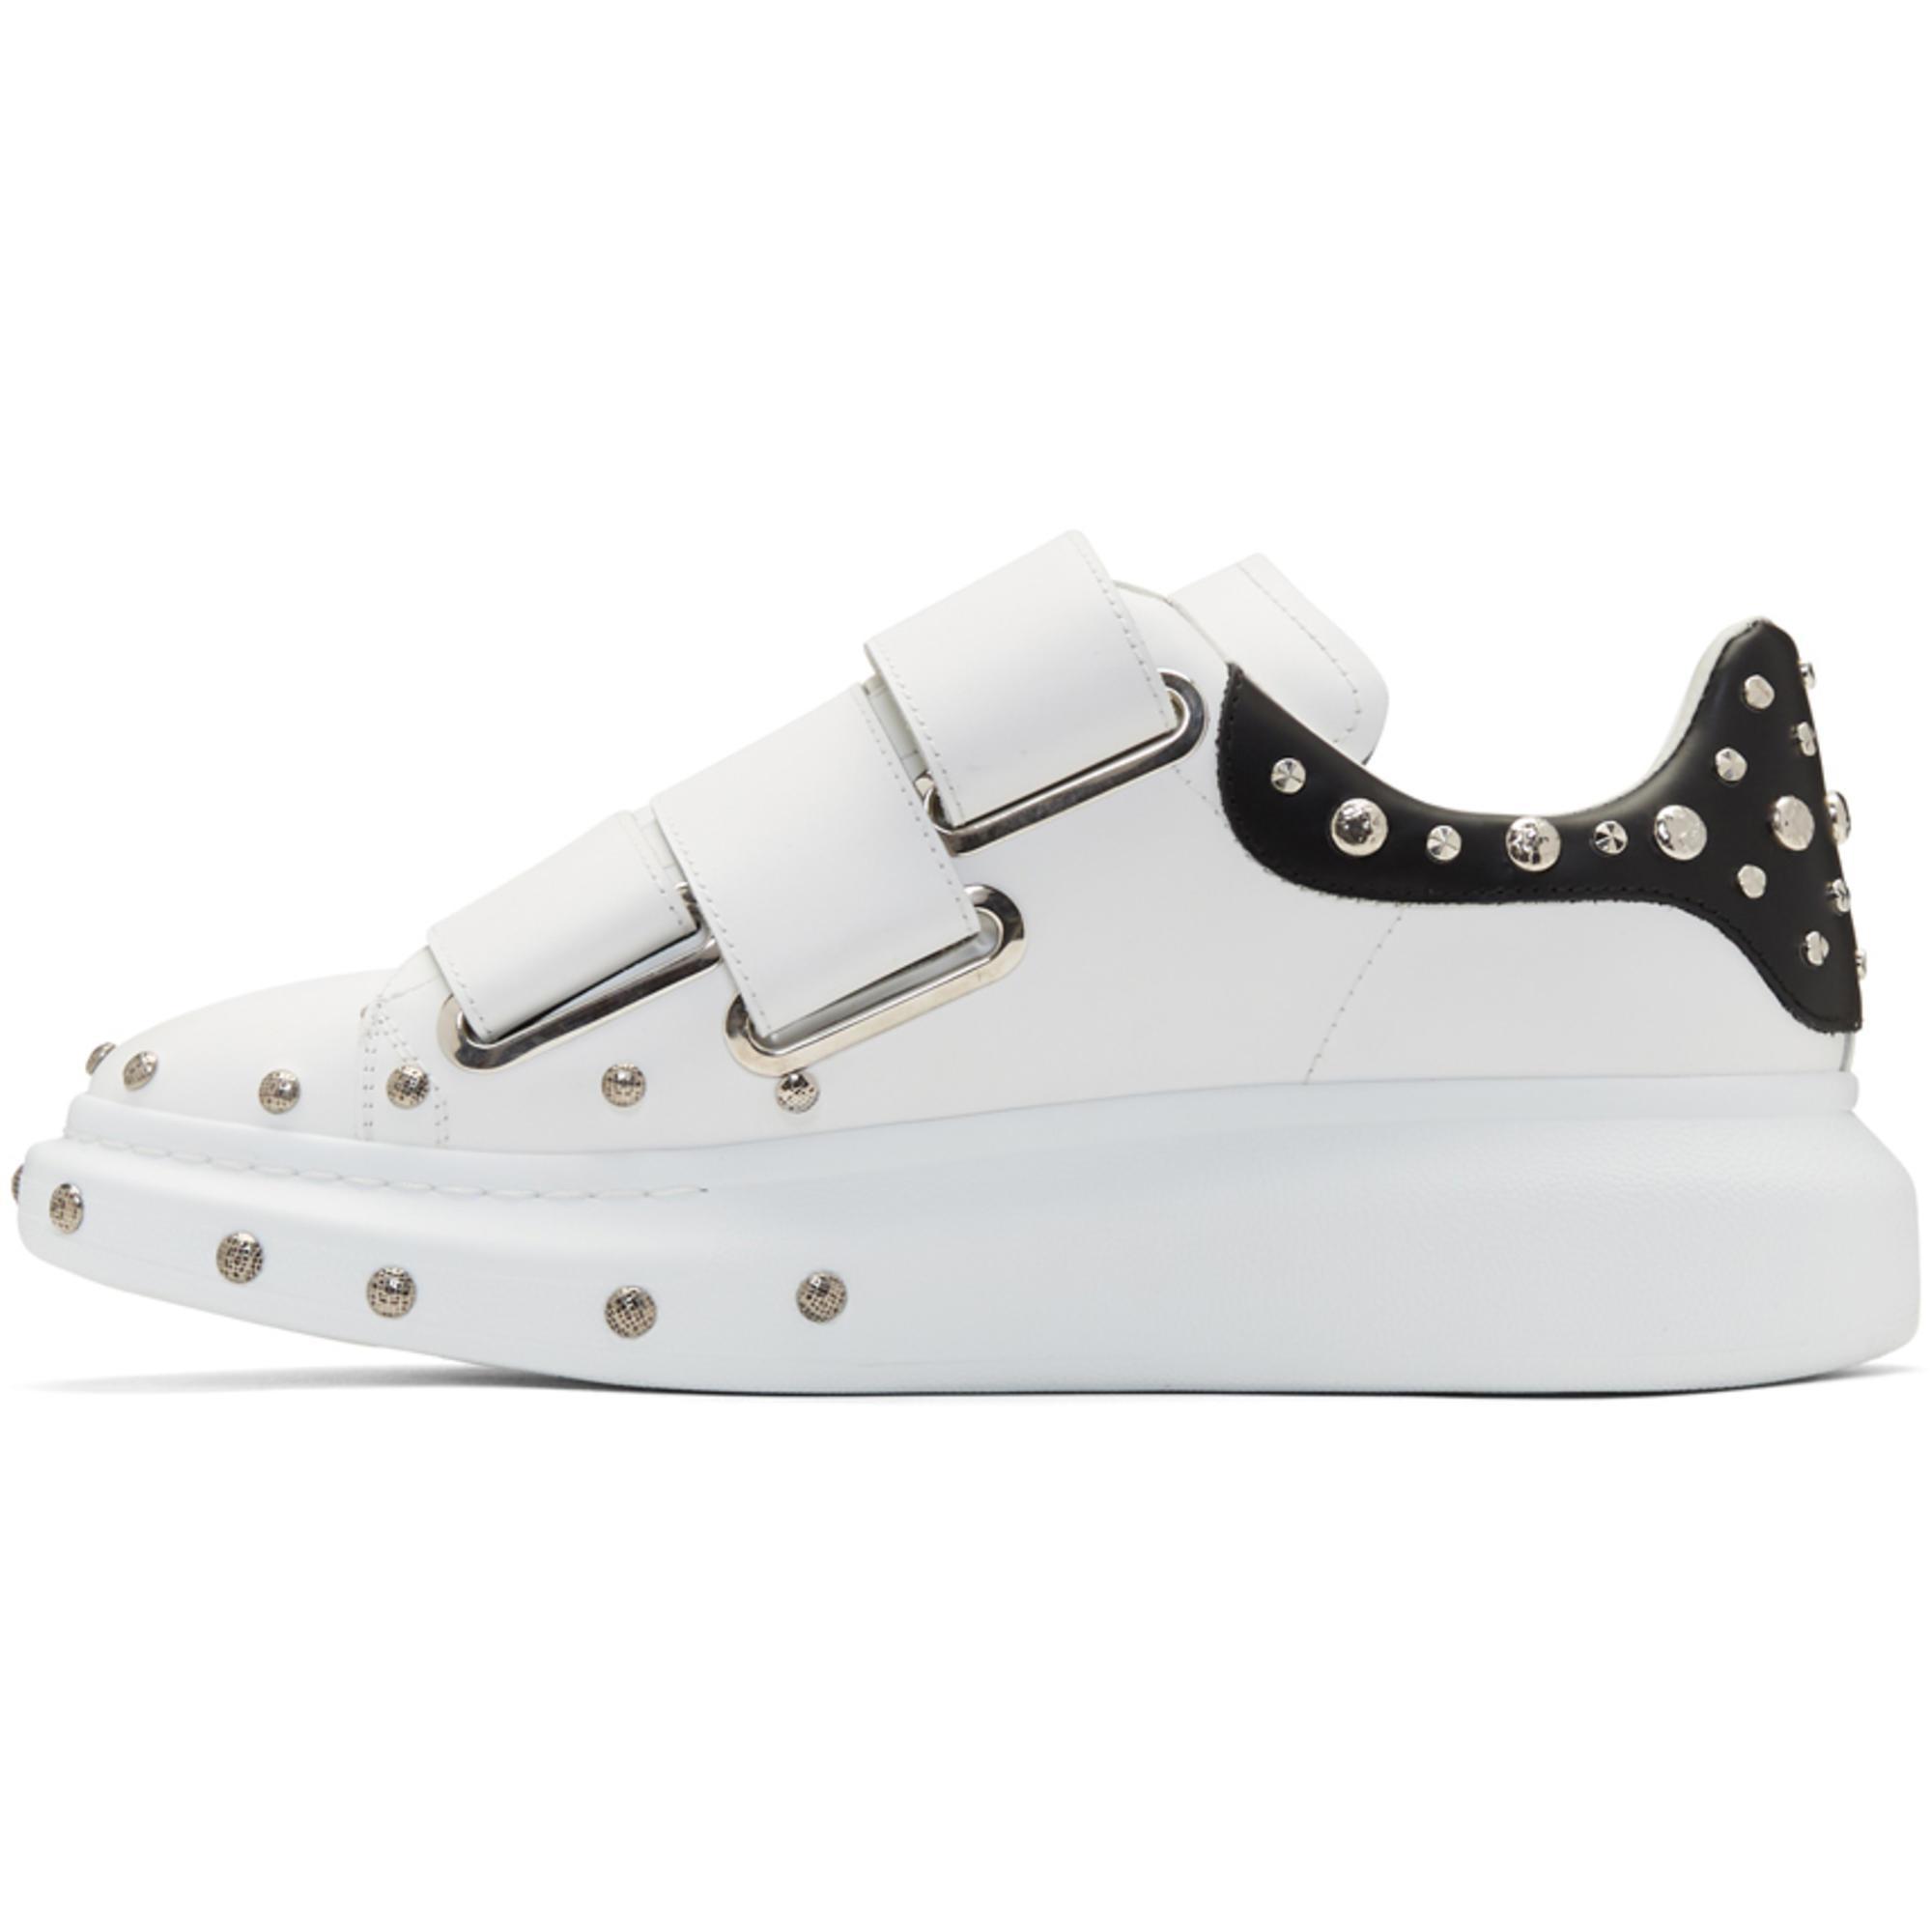 Alexander McQueen White & Black Studded Straps Oversized Sneakers 0CIJvuE